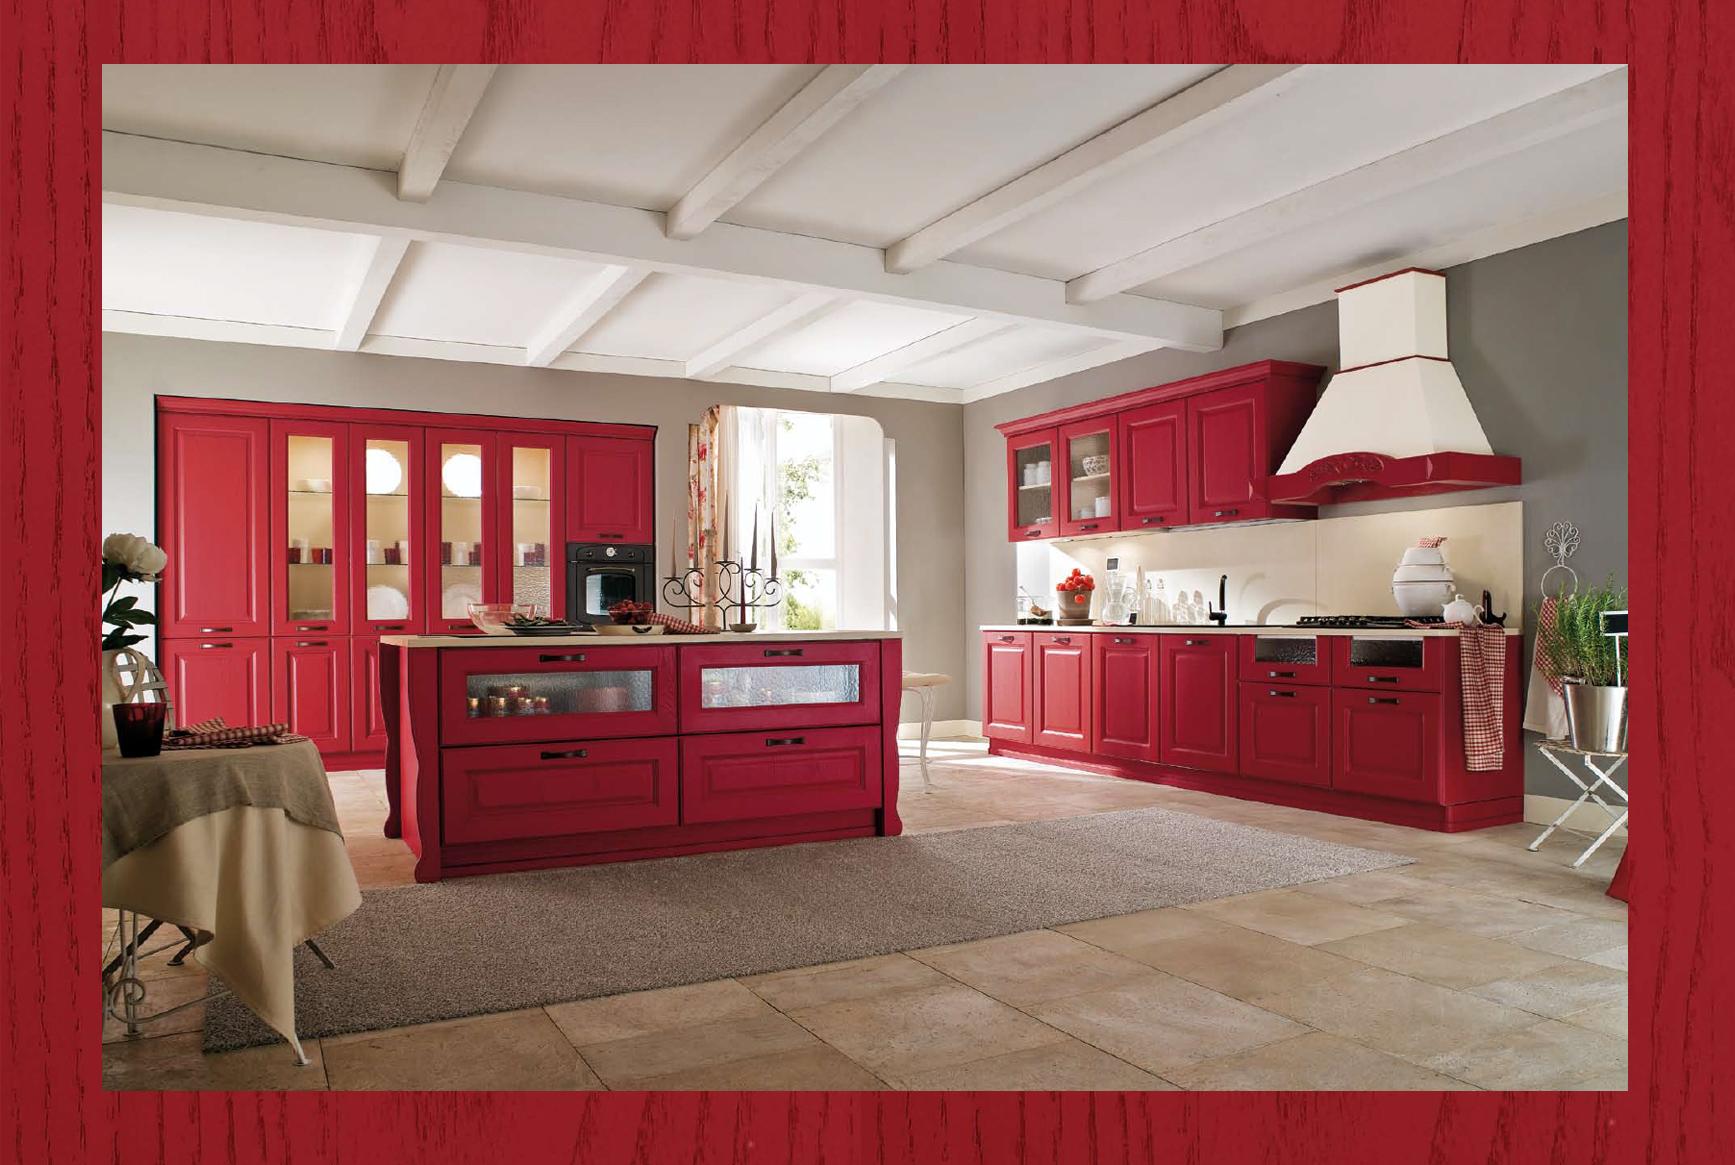 Awesome Colorare La Cucina Images - Schneefreunde.com ...